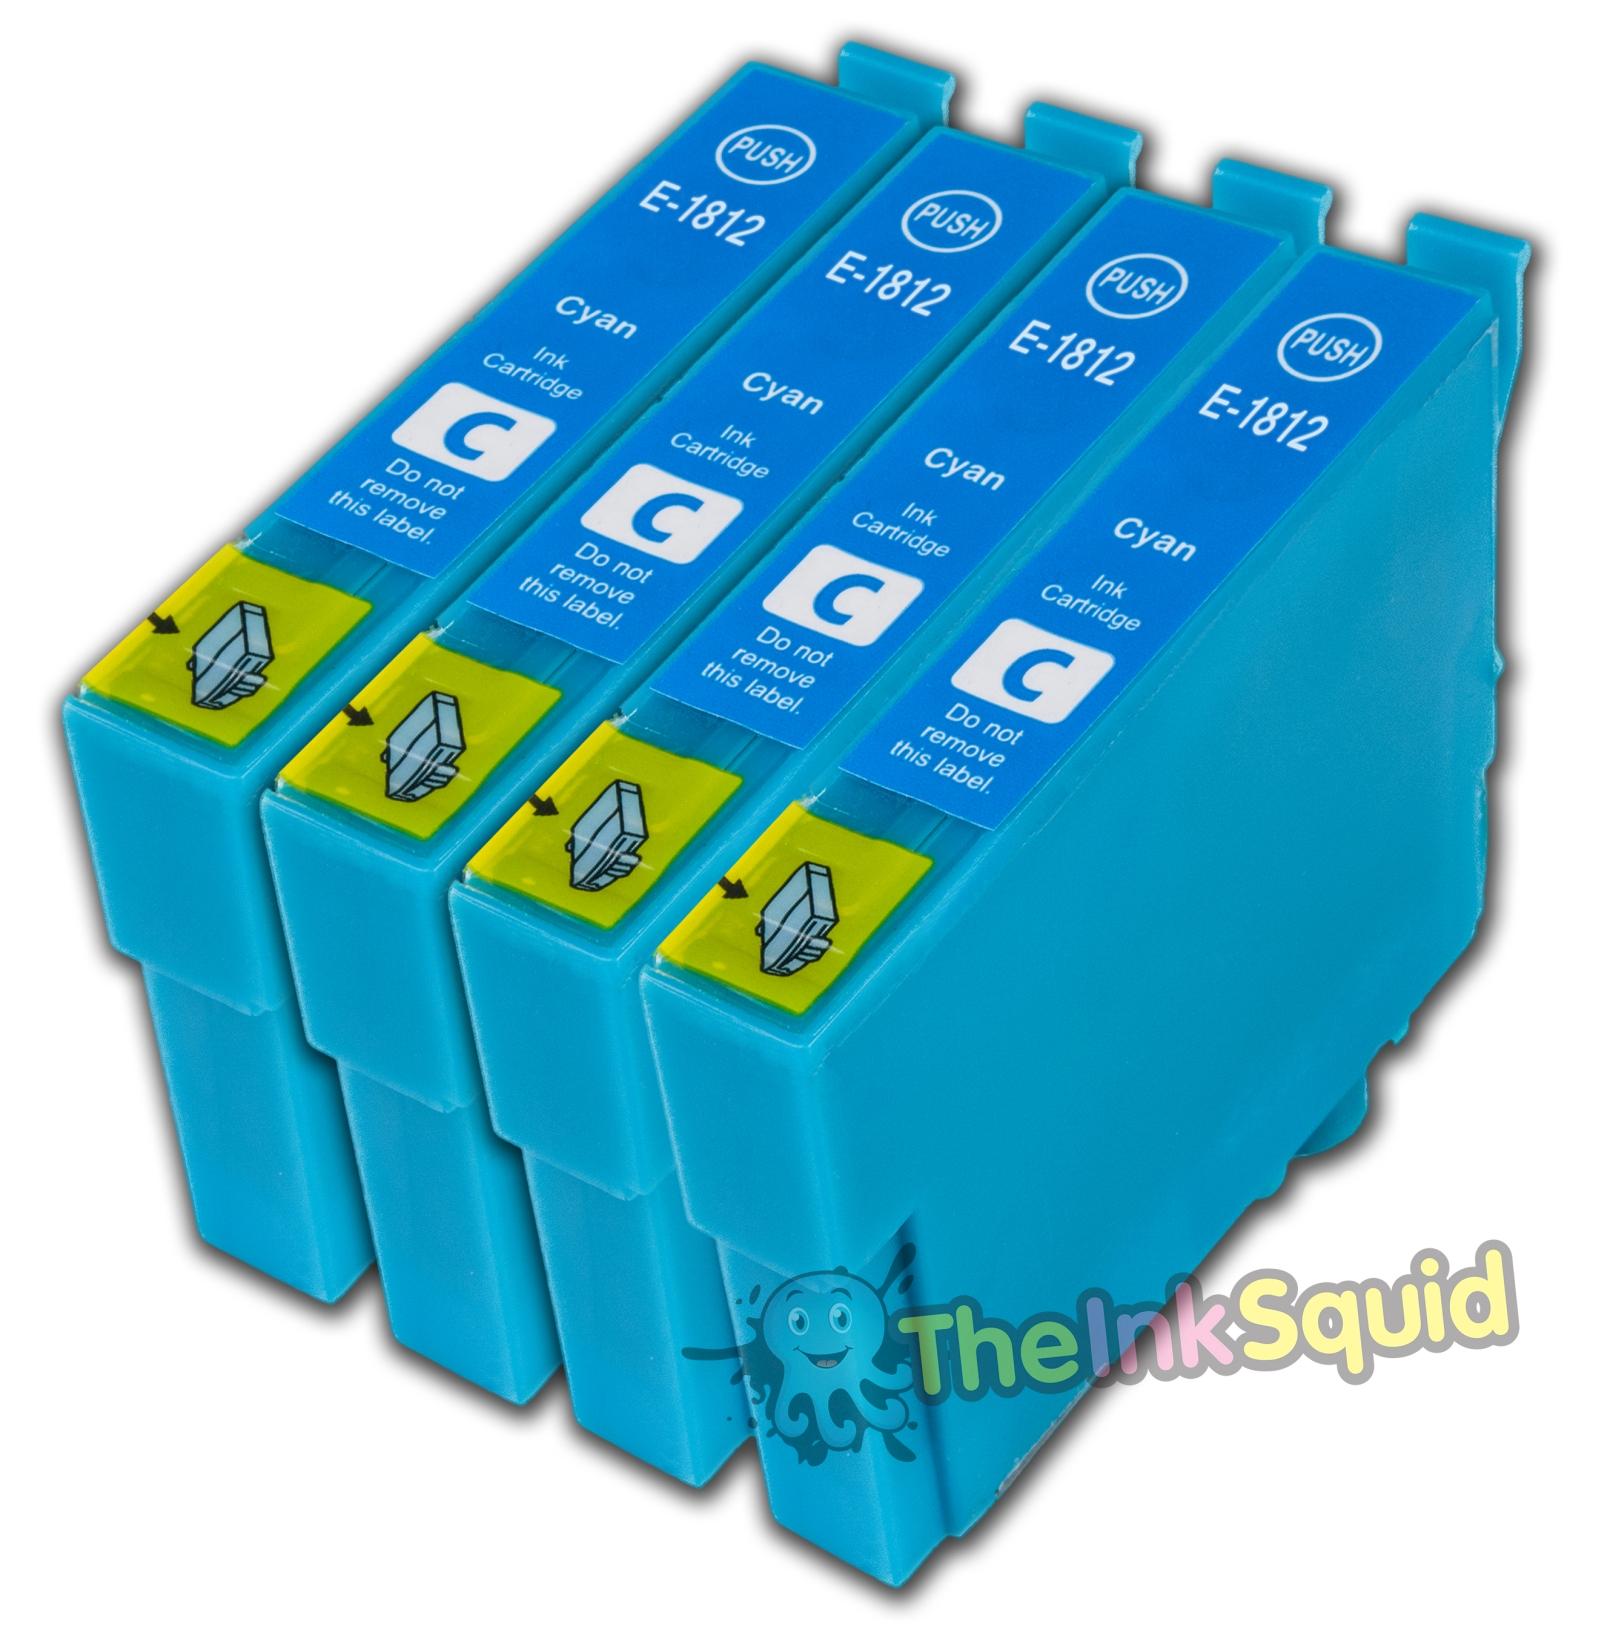 T1802-XL-Cyan-Blue-non-OEM-Epson-Daisy-ink-cartridge-T1812-T1816-15ml